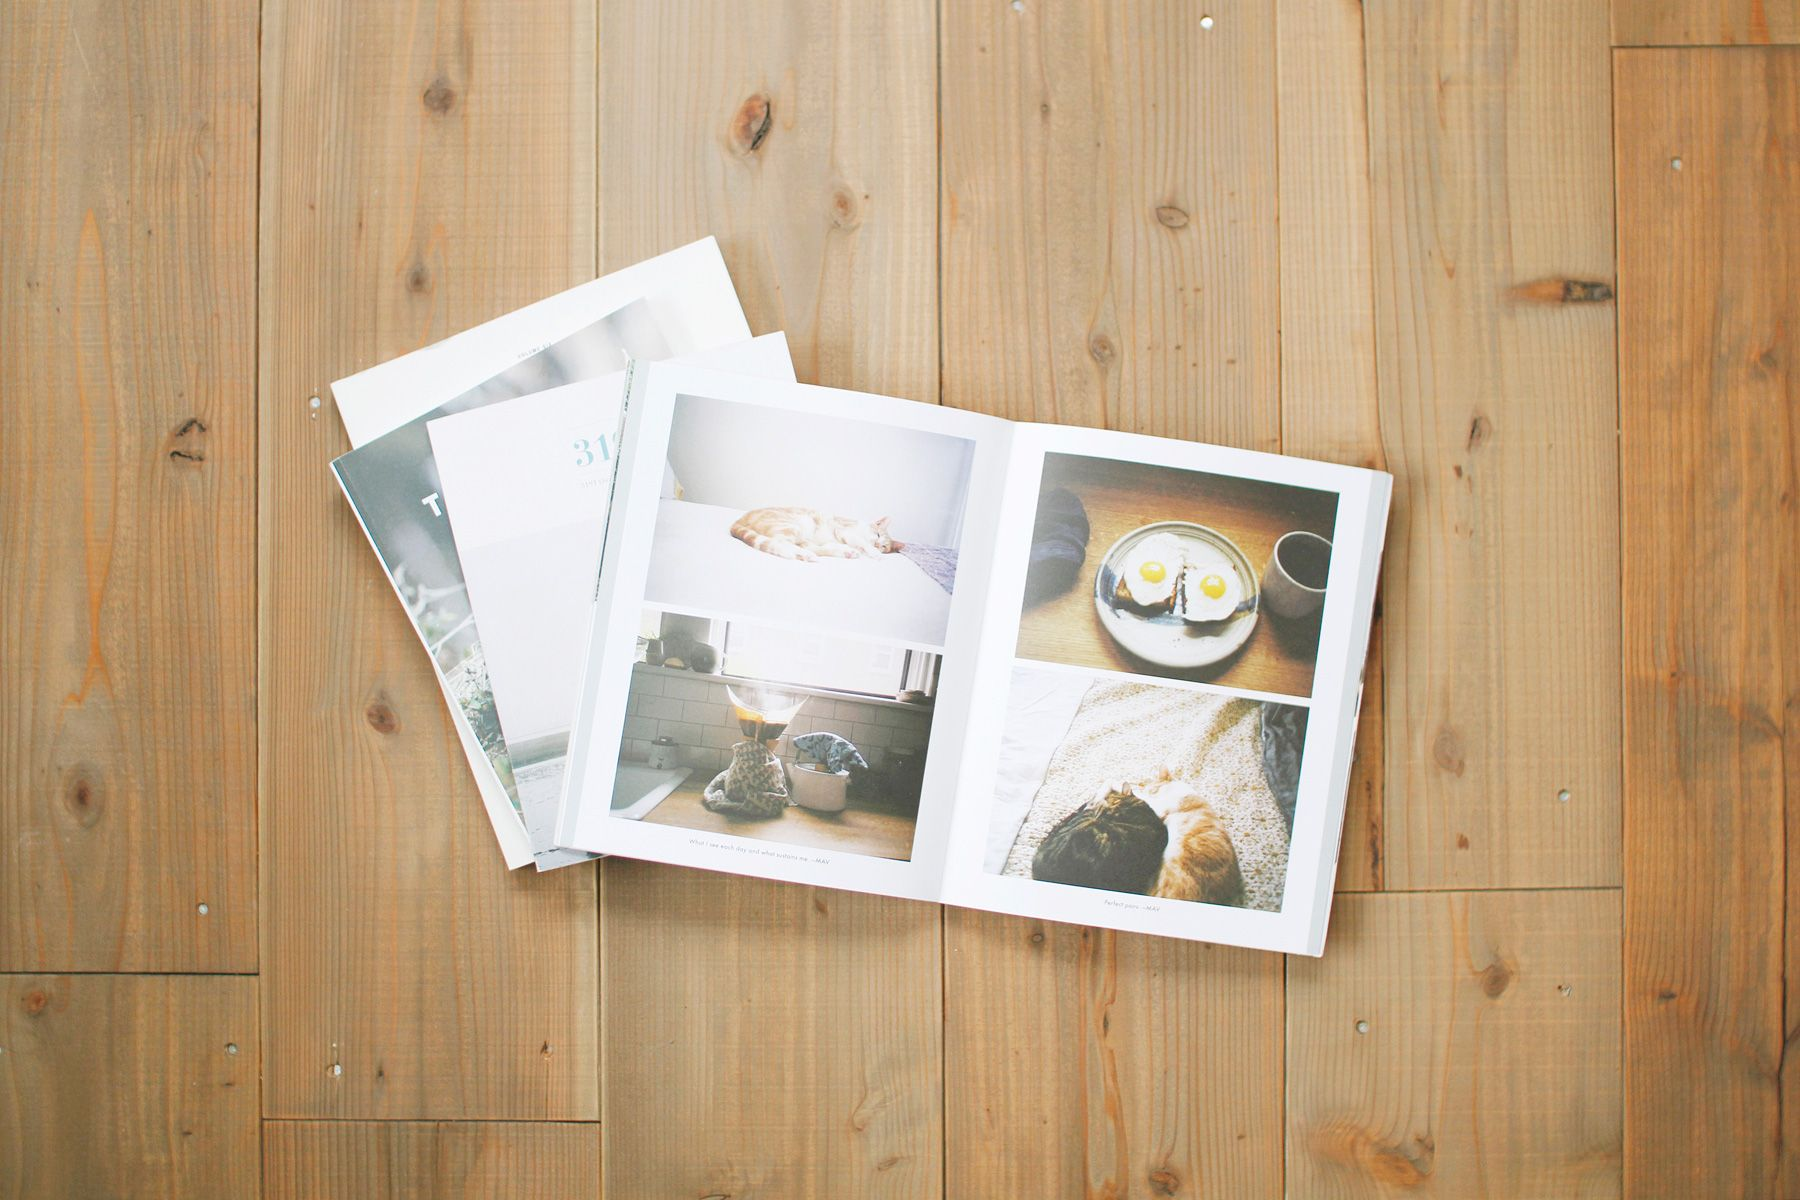 HEFT WHITE APARTMENT (ヘフト ホワイトアパートメント)フローリング 無垢床